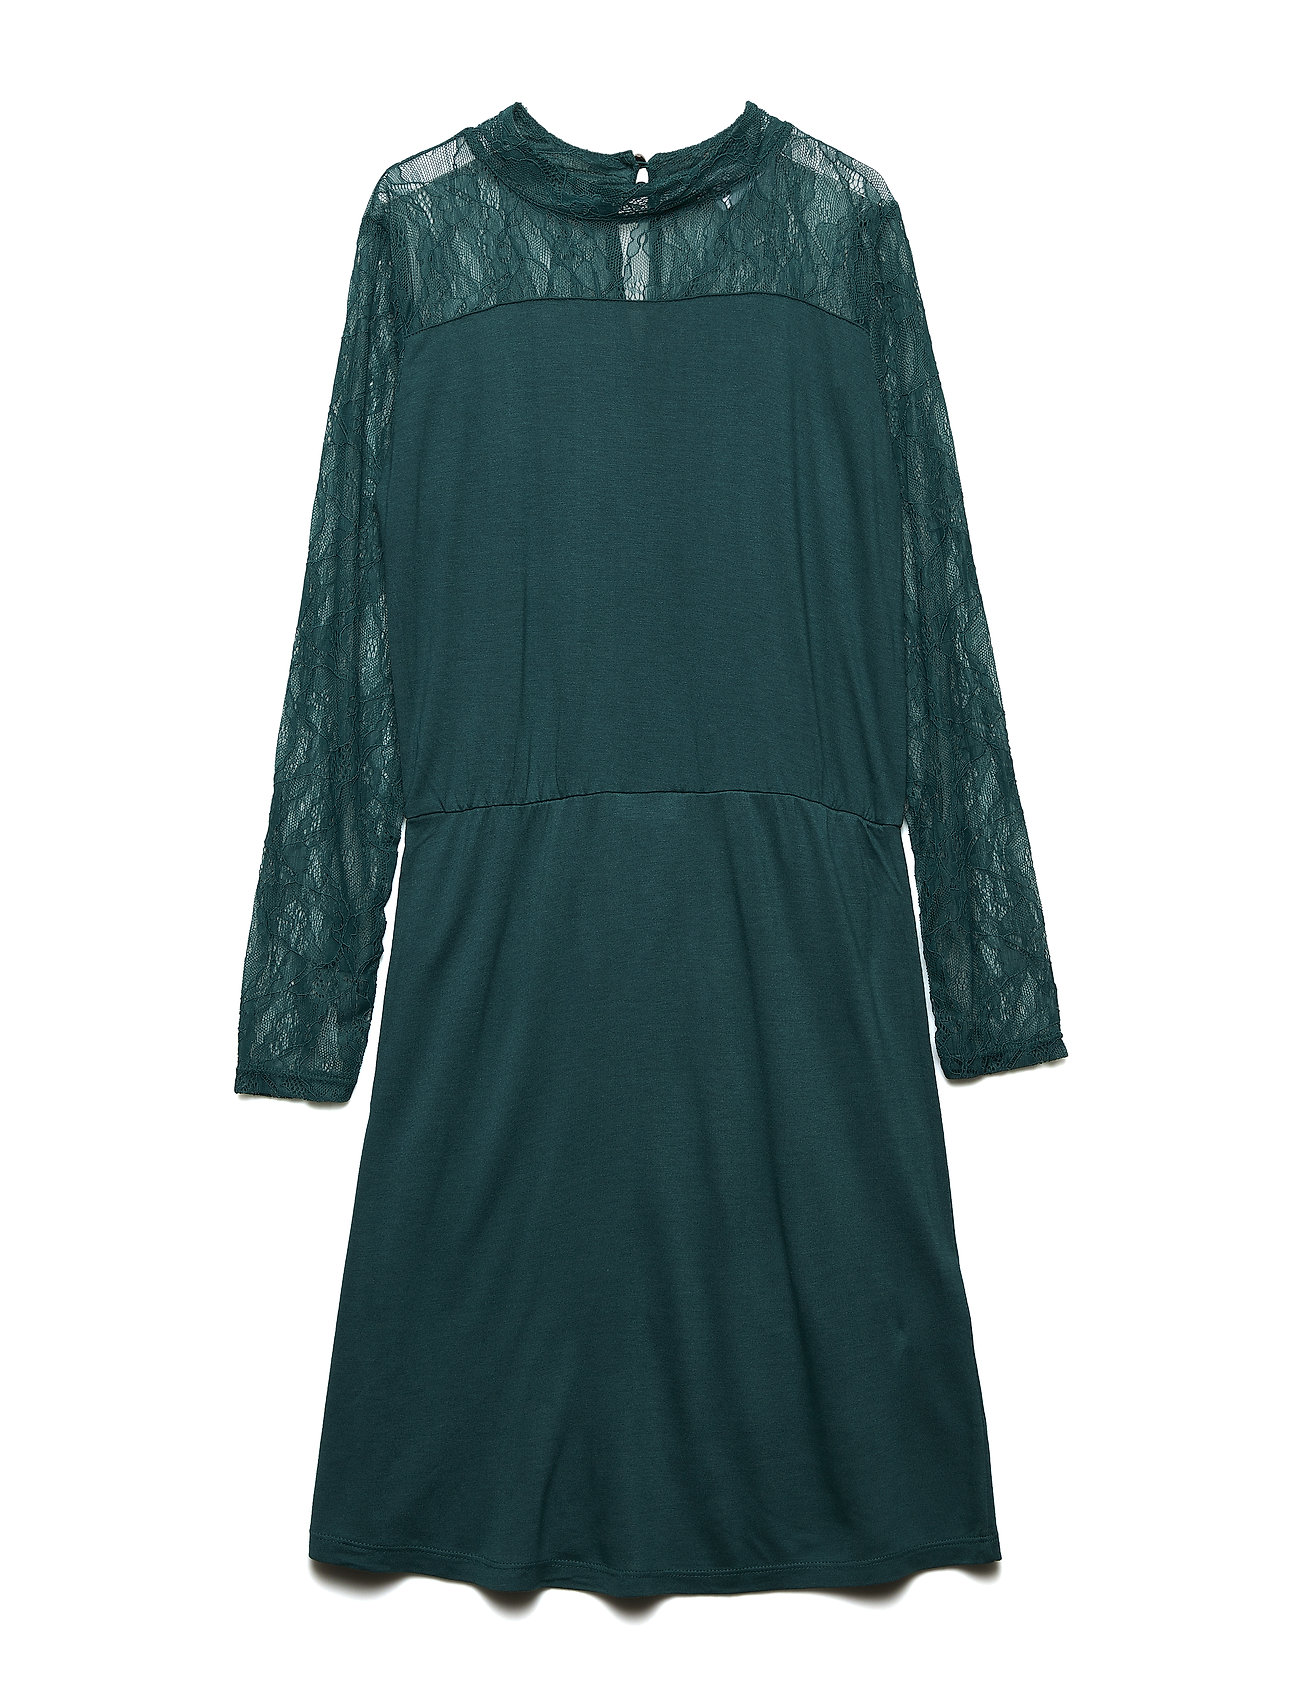 The New ISOLDE L_S DRESS - JUNE BUG